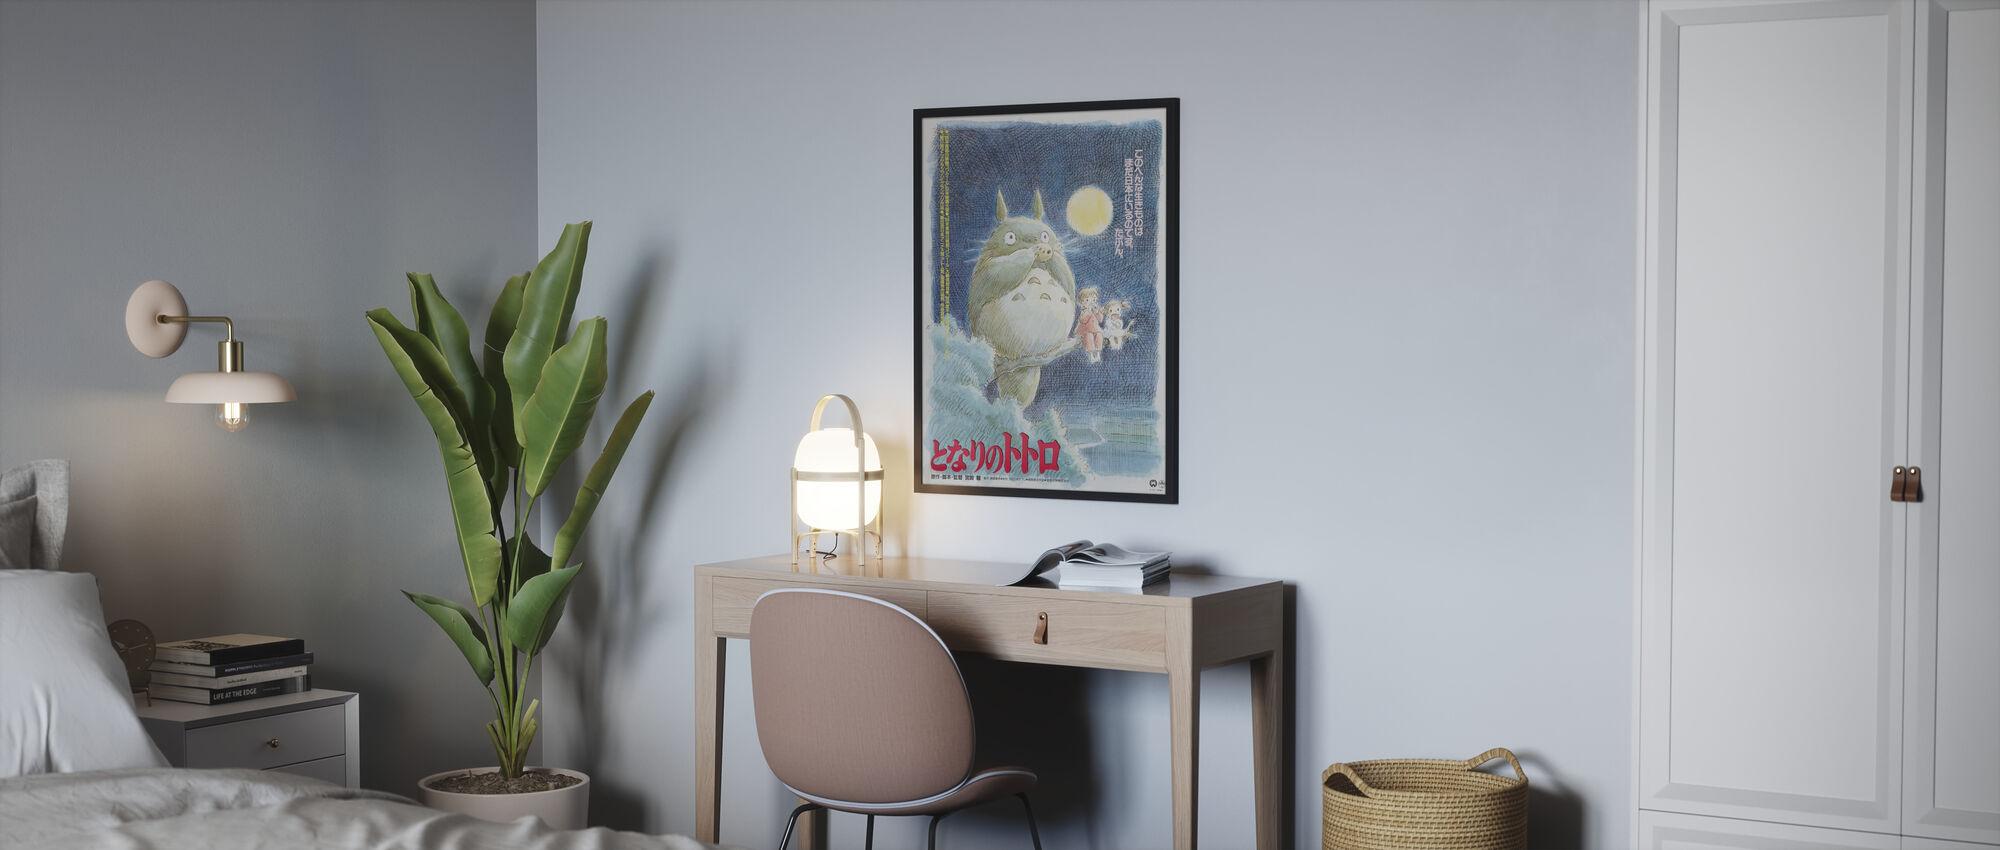 My Neighbor Totoro - Framed print - Bedroom